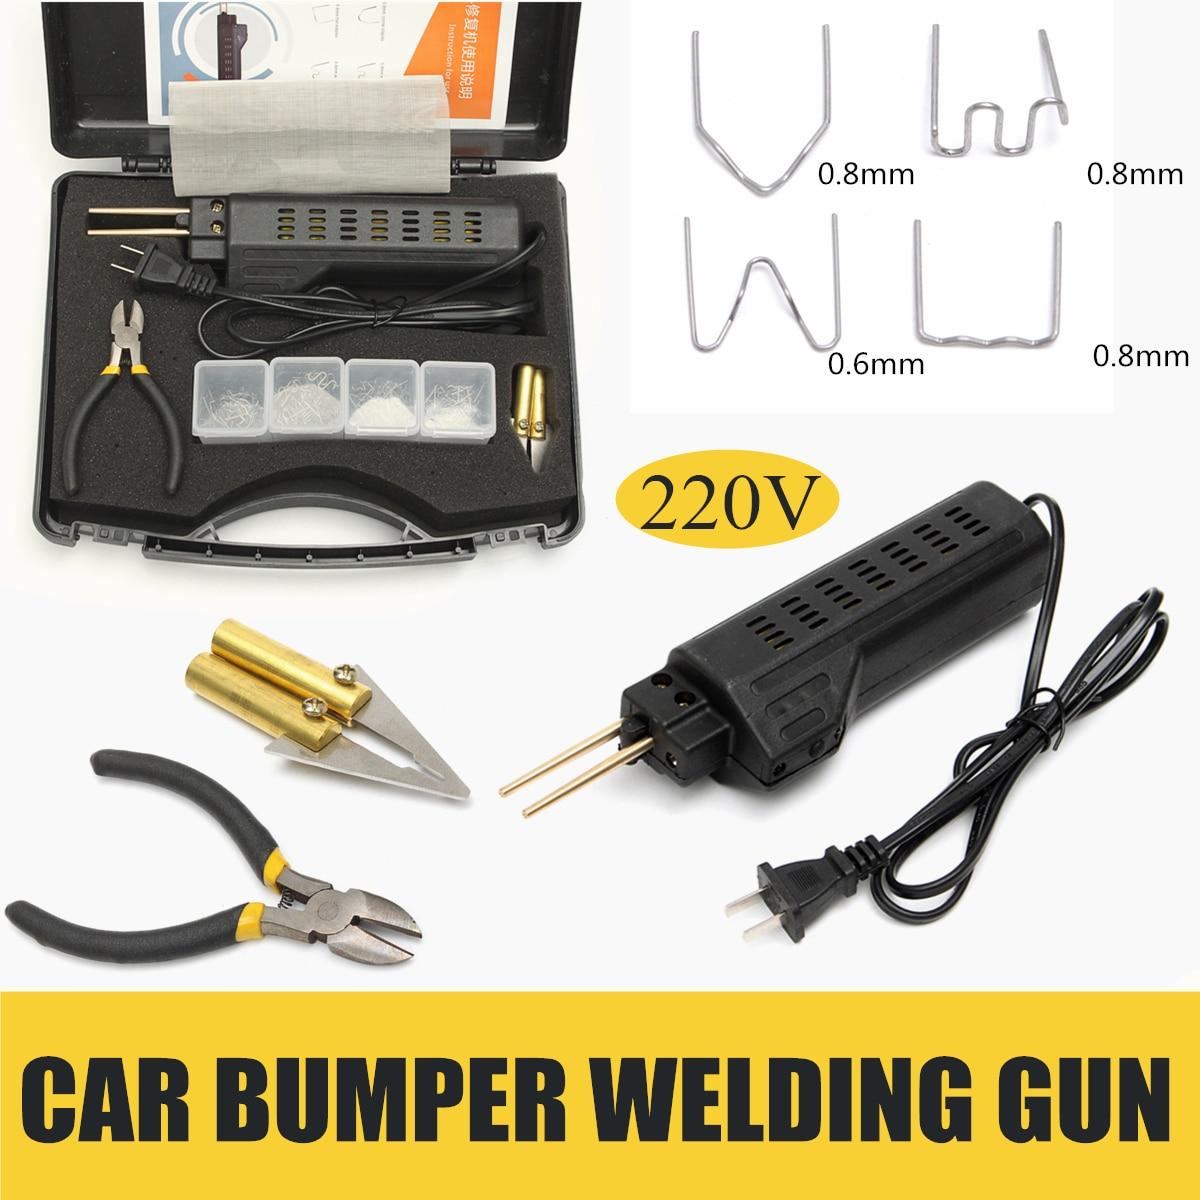 Best Price 220-250v Hot Stapler Car Bumper Plastic Welding Torch Fairing Auto Body Tool Welder-machine 0.6/0.8mm Plastic Welders 200 Staples